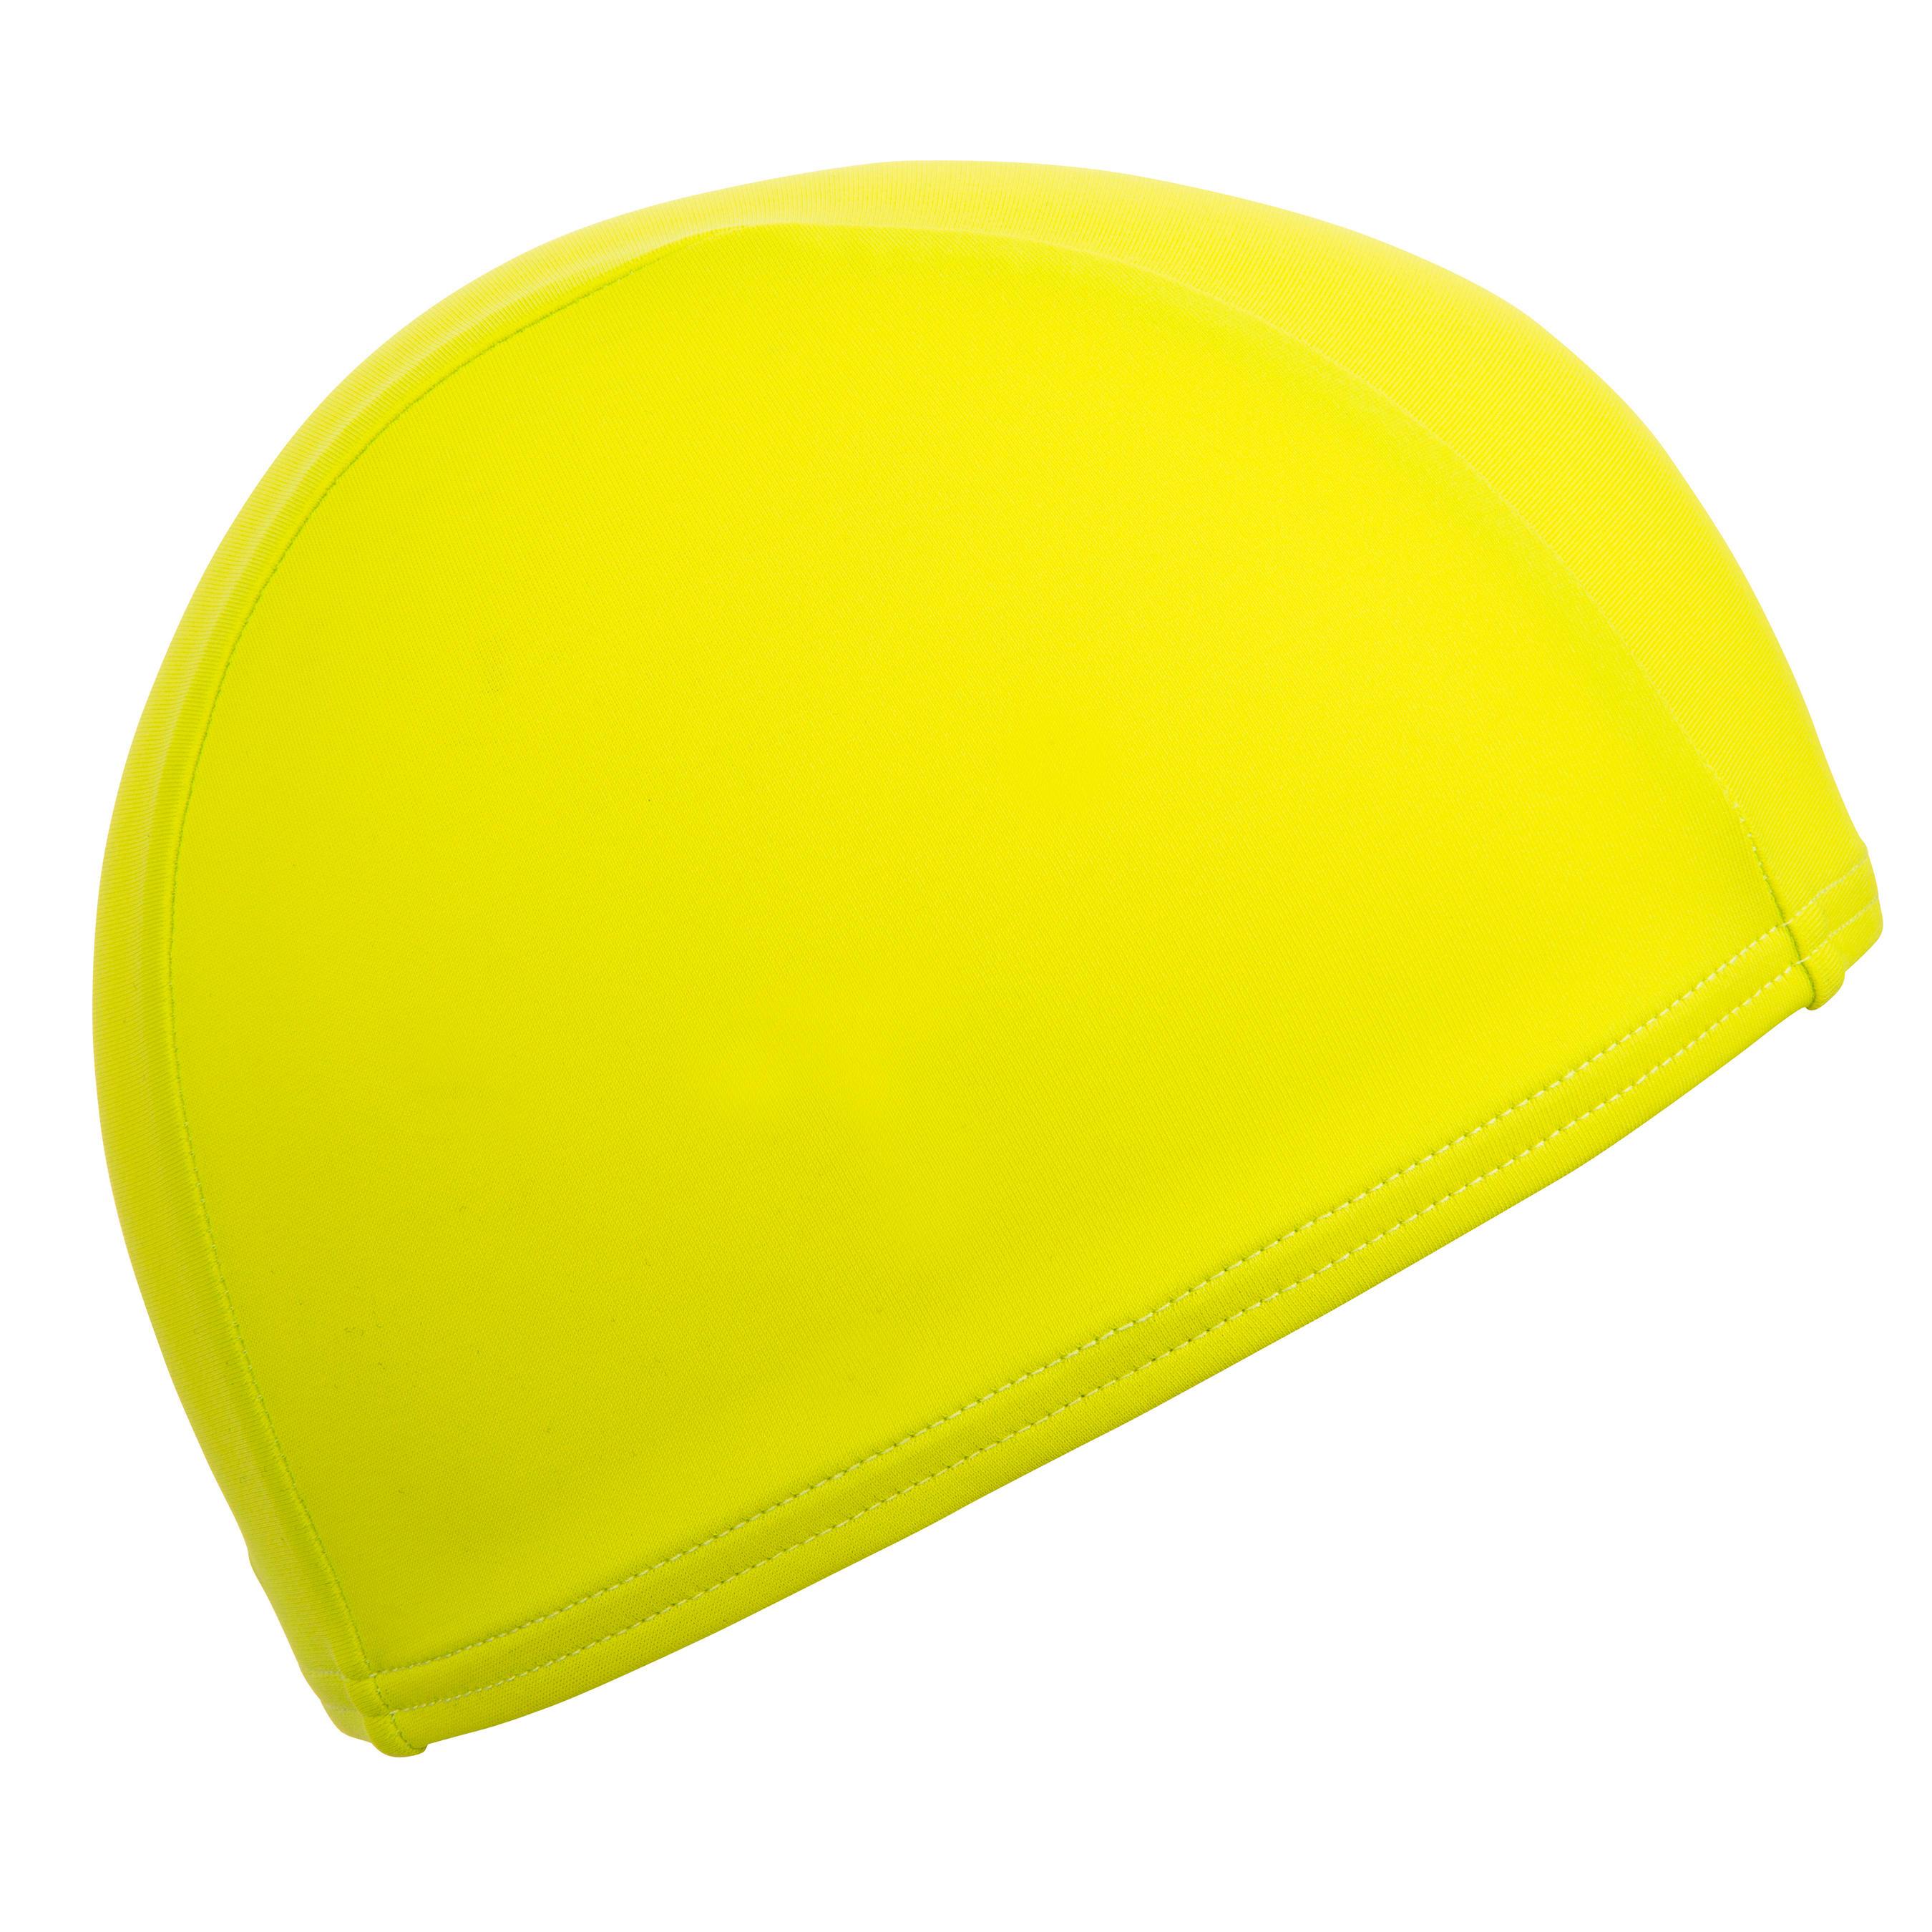 Adult Swim cap mesh- green yellow